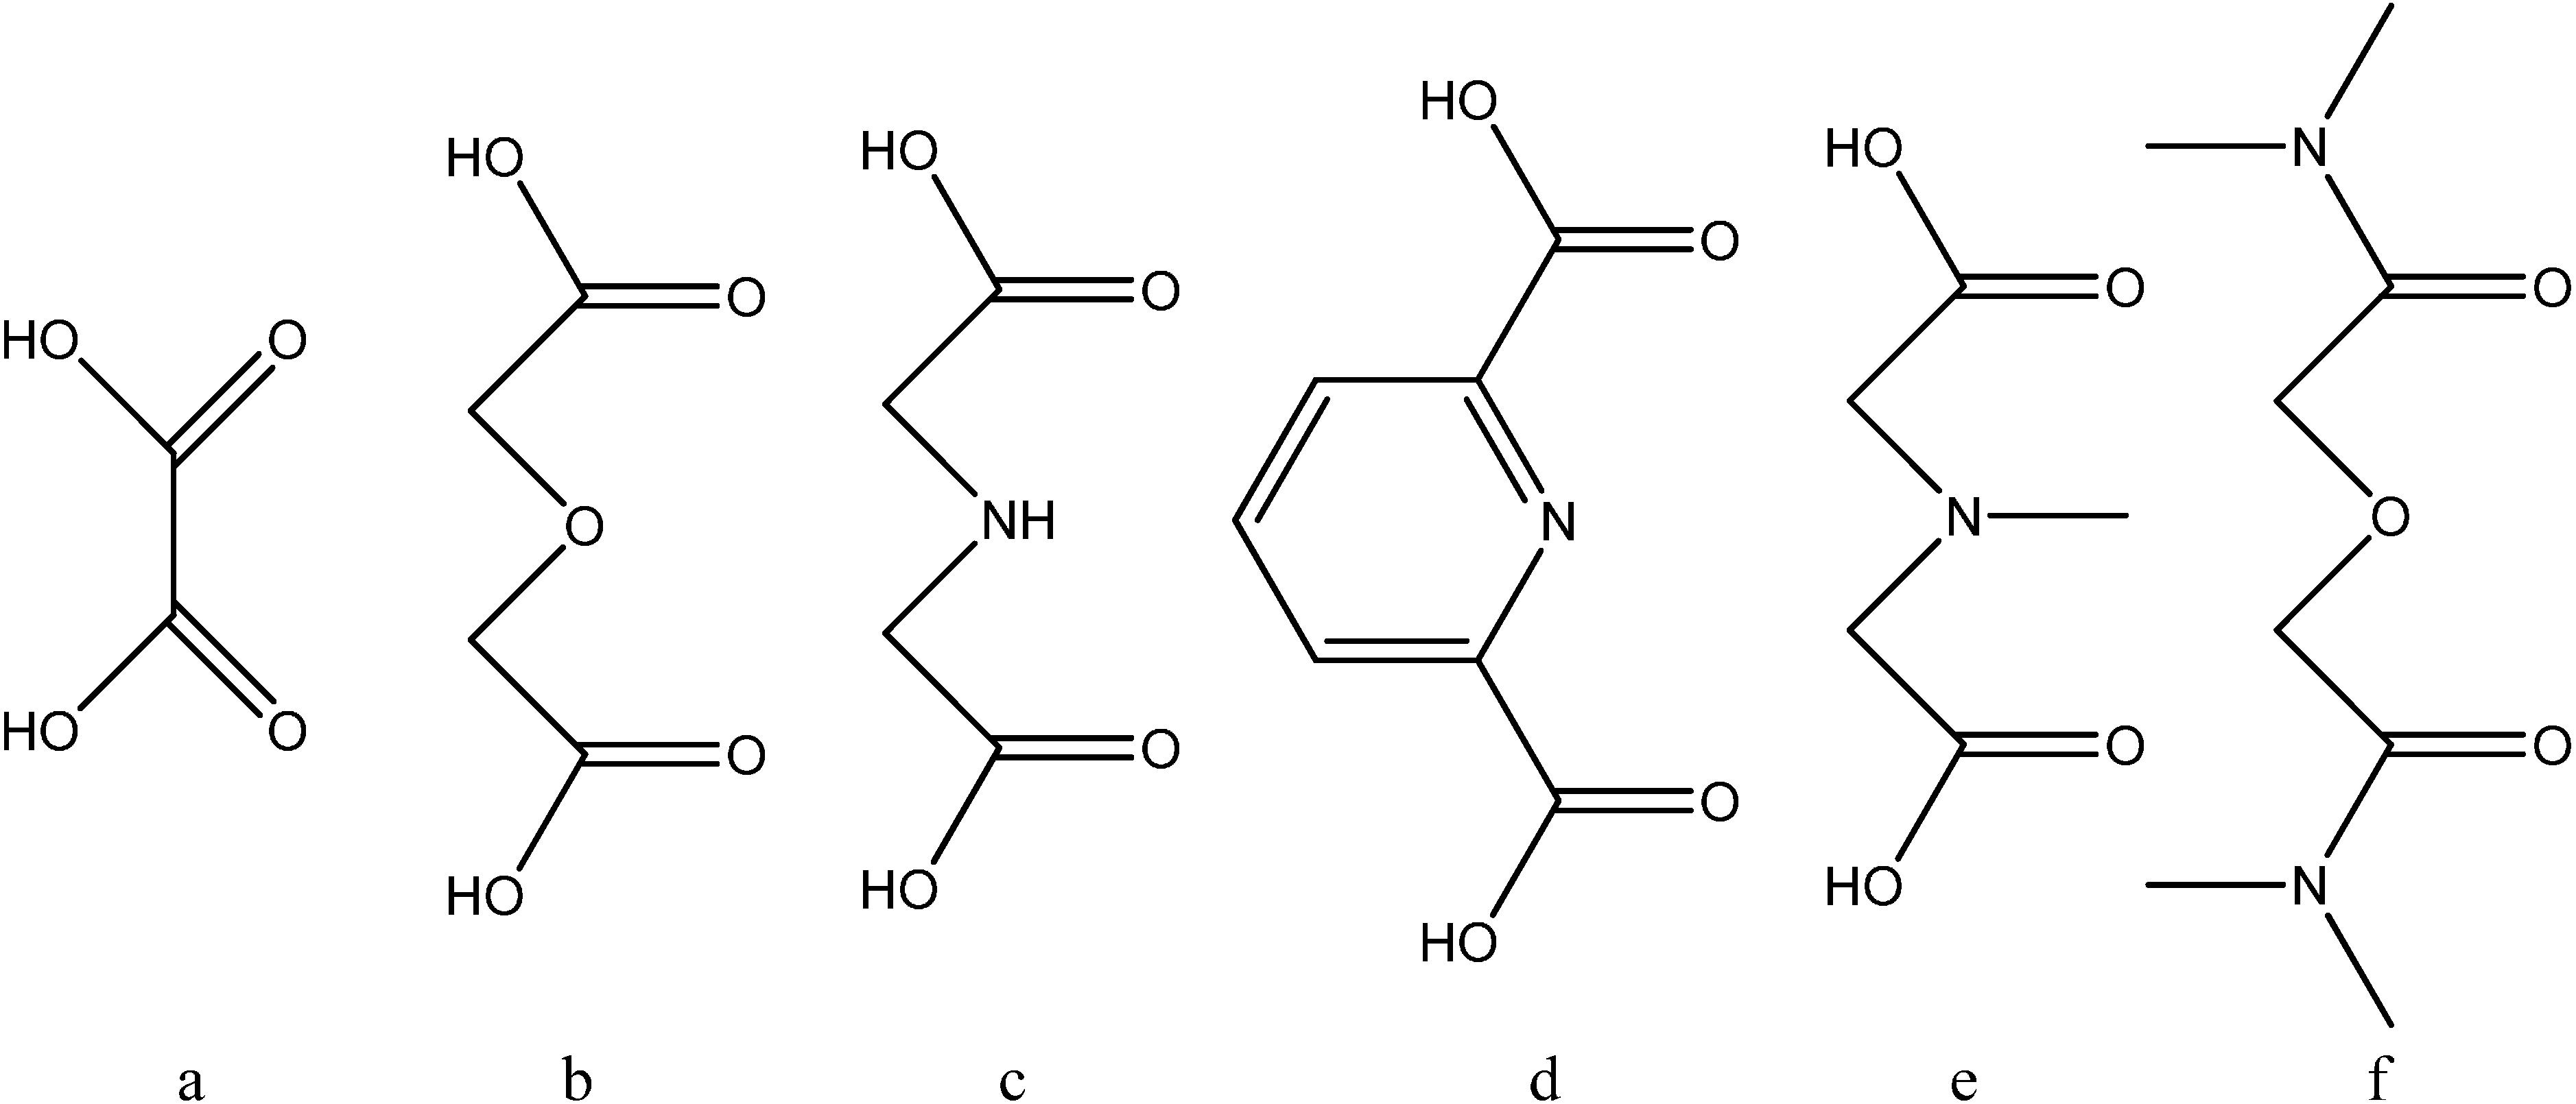 protactinium iii ion